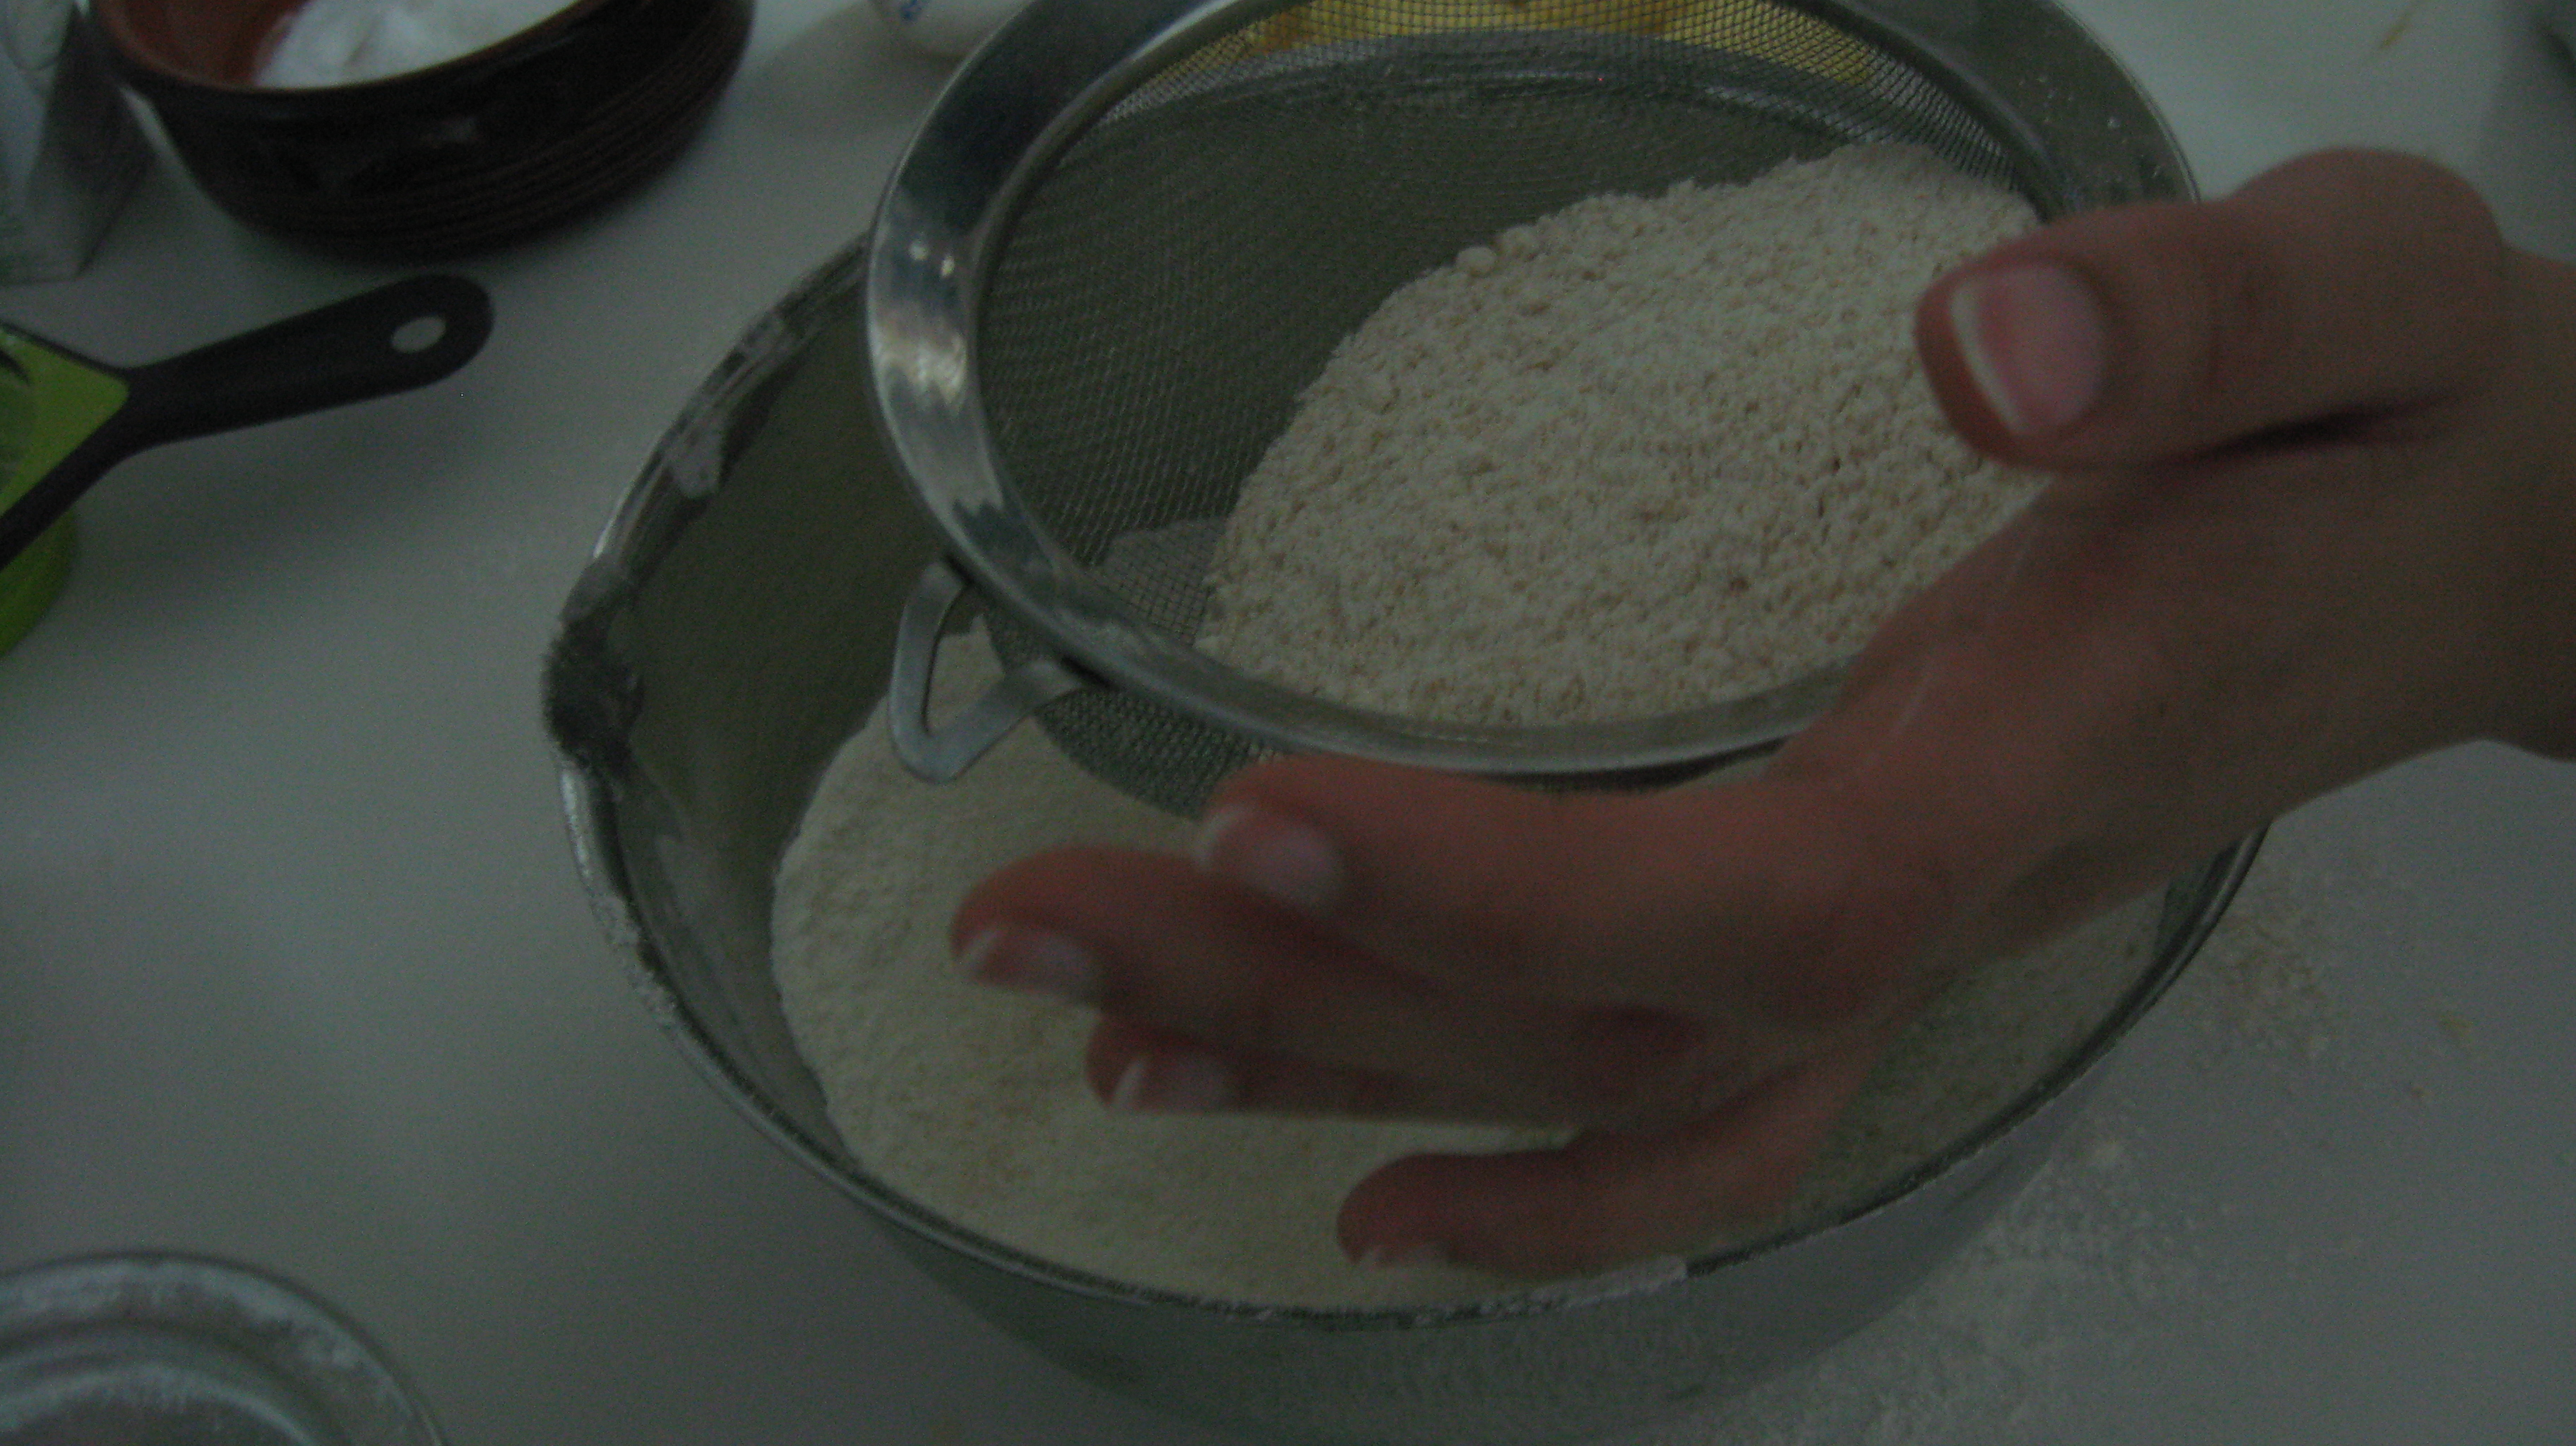 Sift plain and wholeweat flour